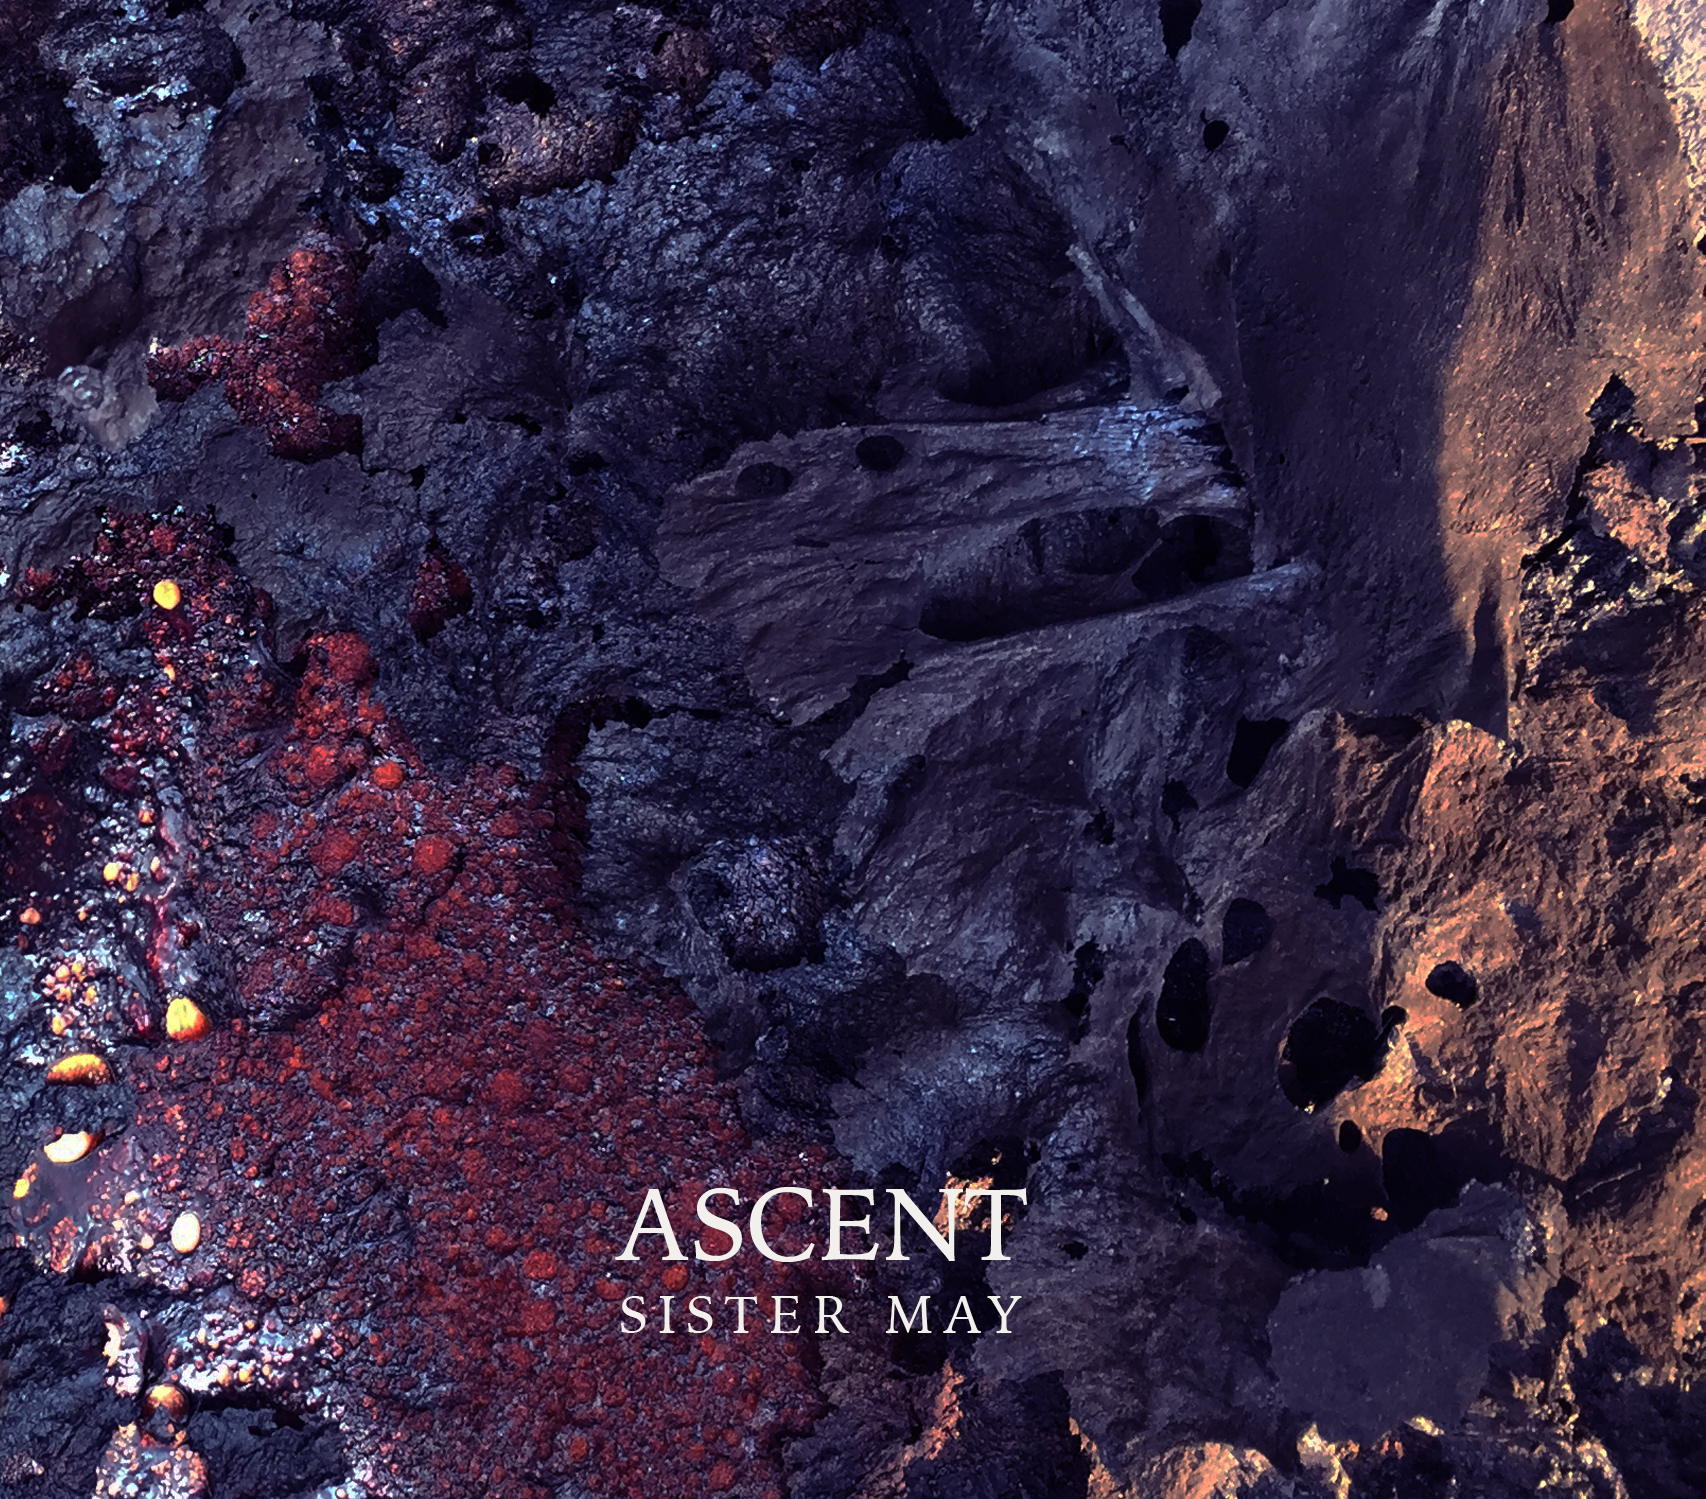 Sister May – Ascent